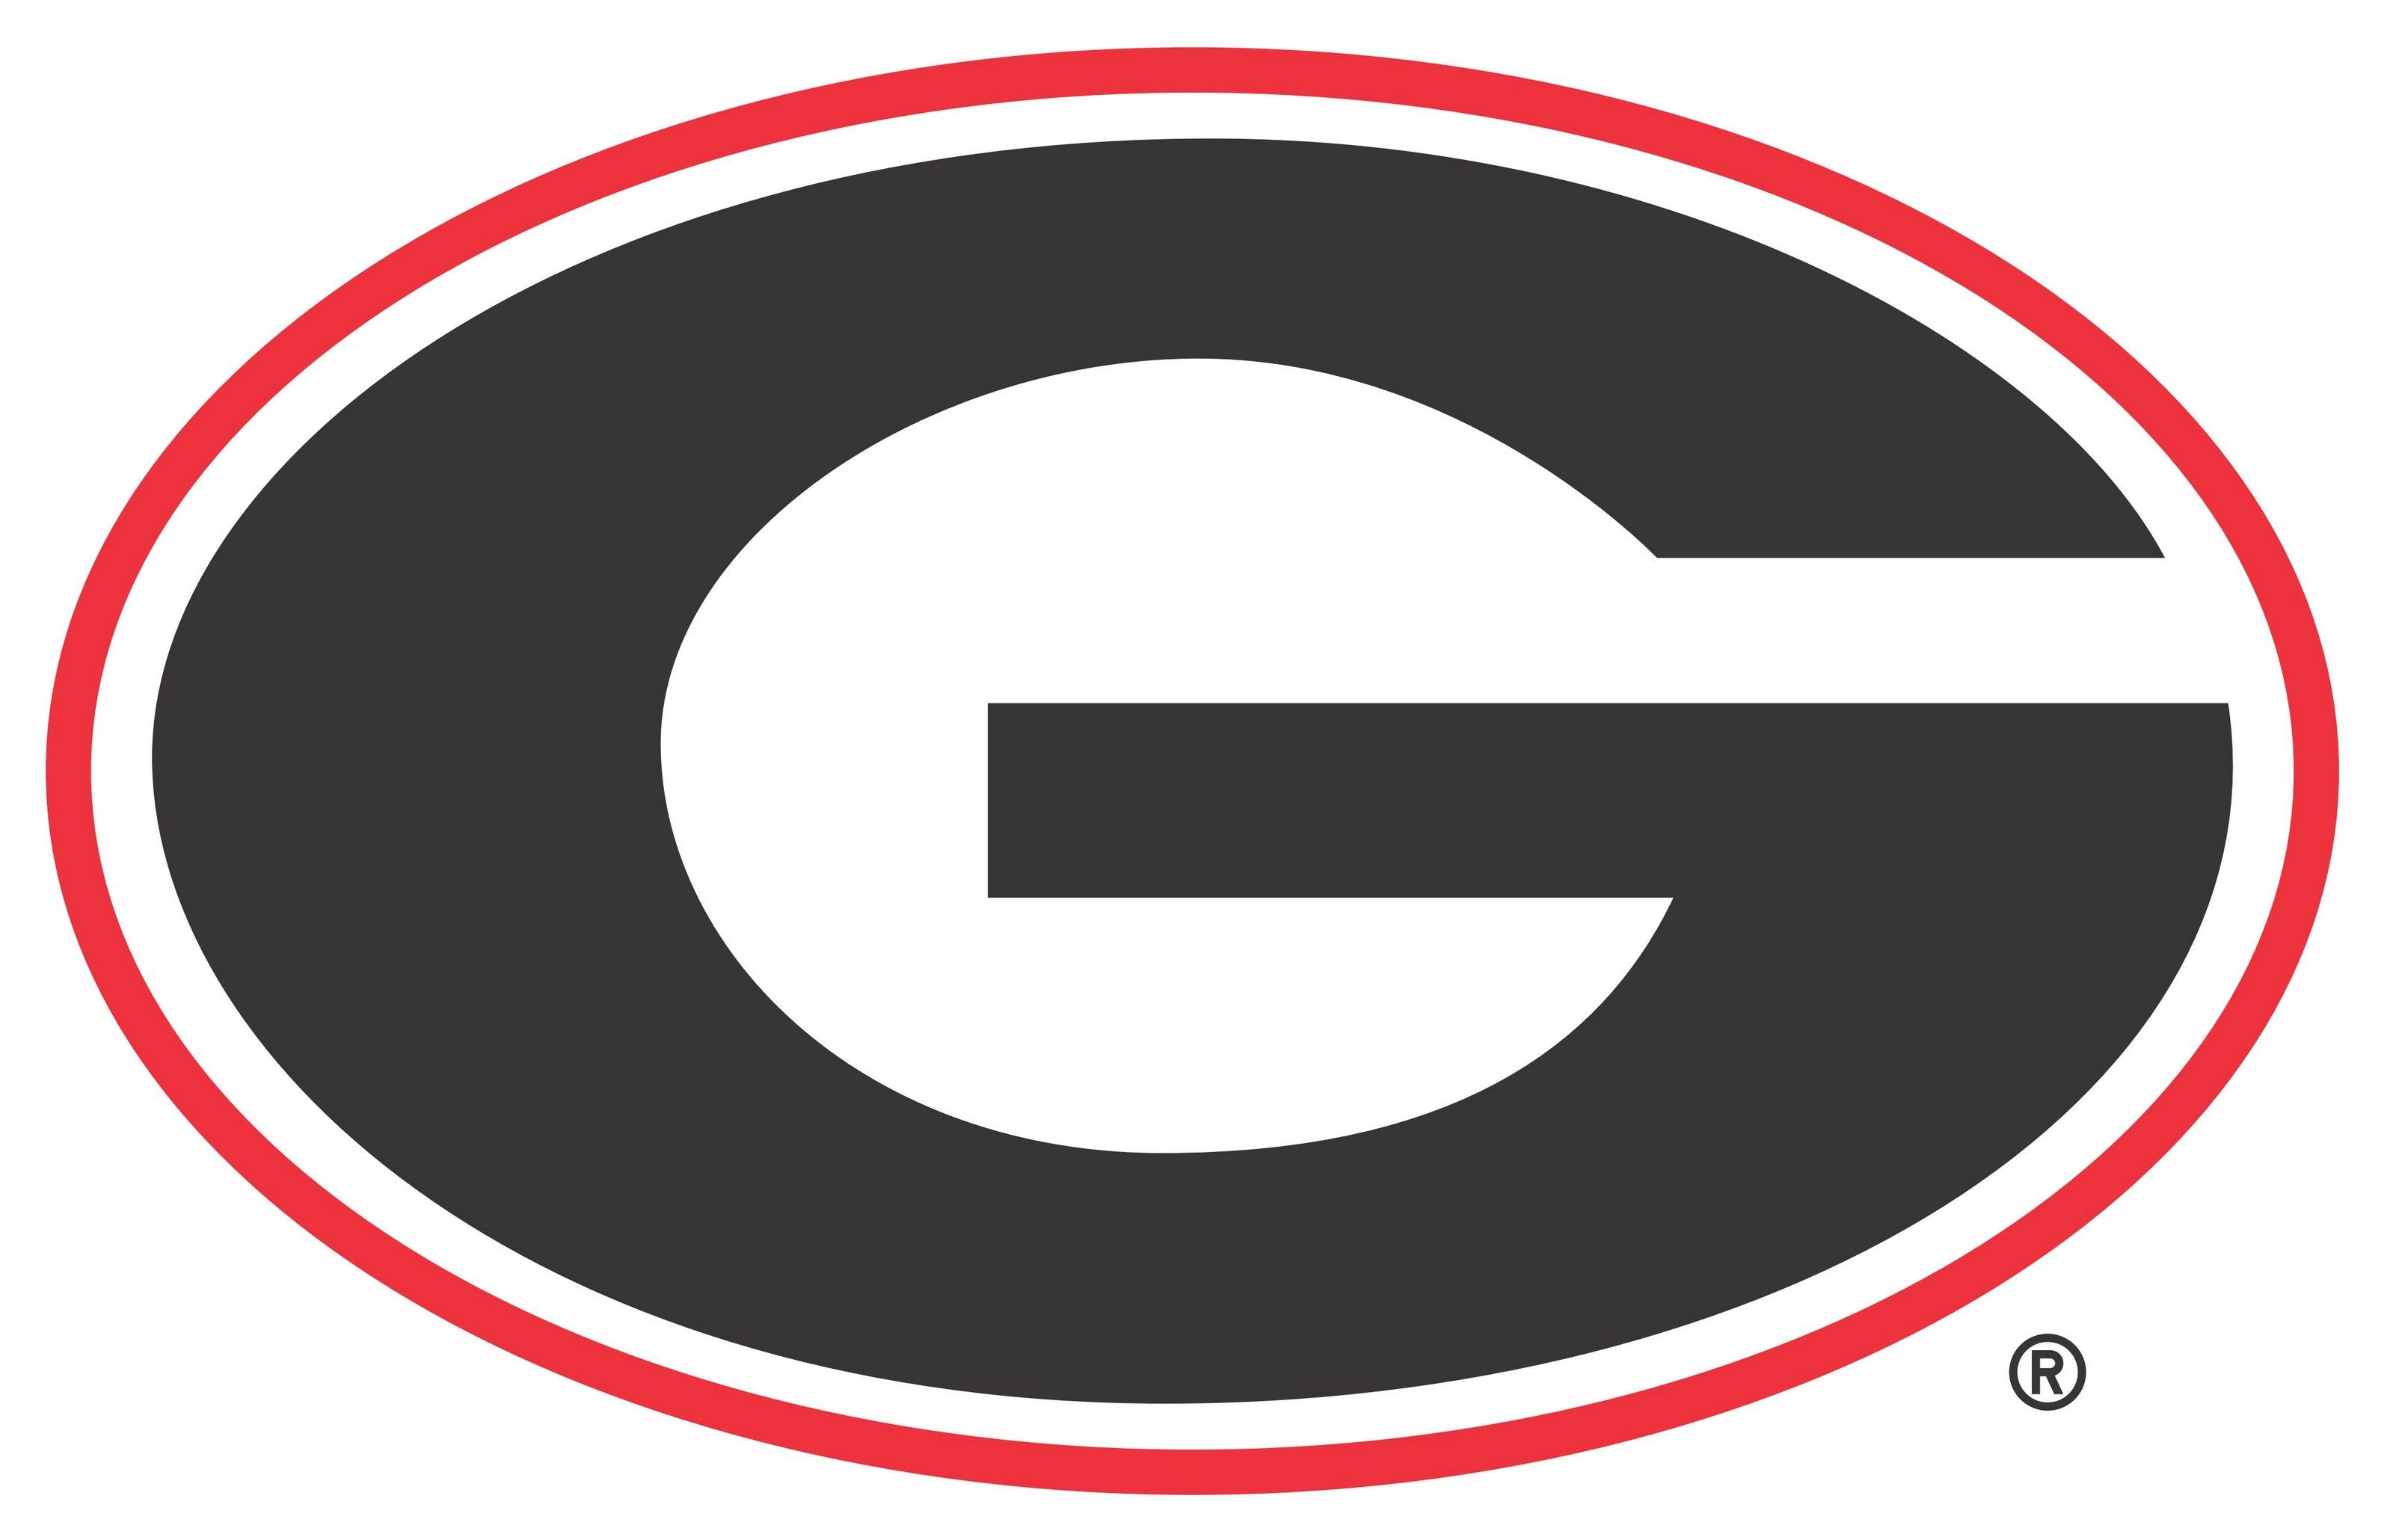 Ugs University Of Georgia Bulldogs Logos American American Universities Amerikadaki Universiteler Ame Georgia College University Of Georgia College Logo